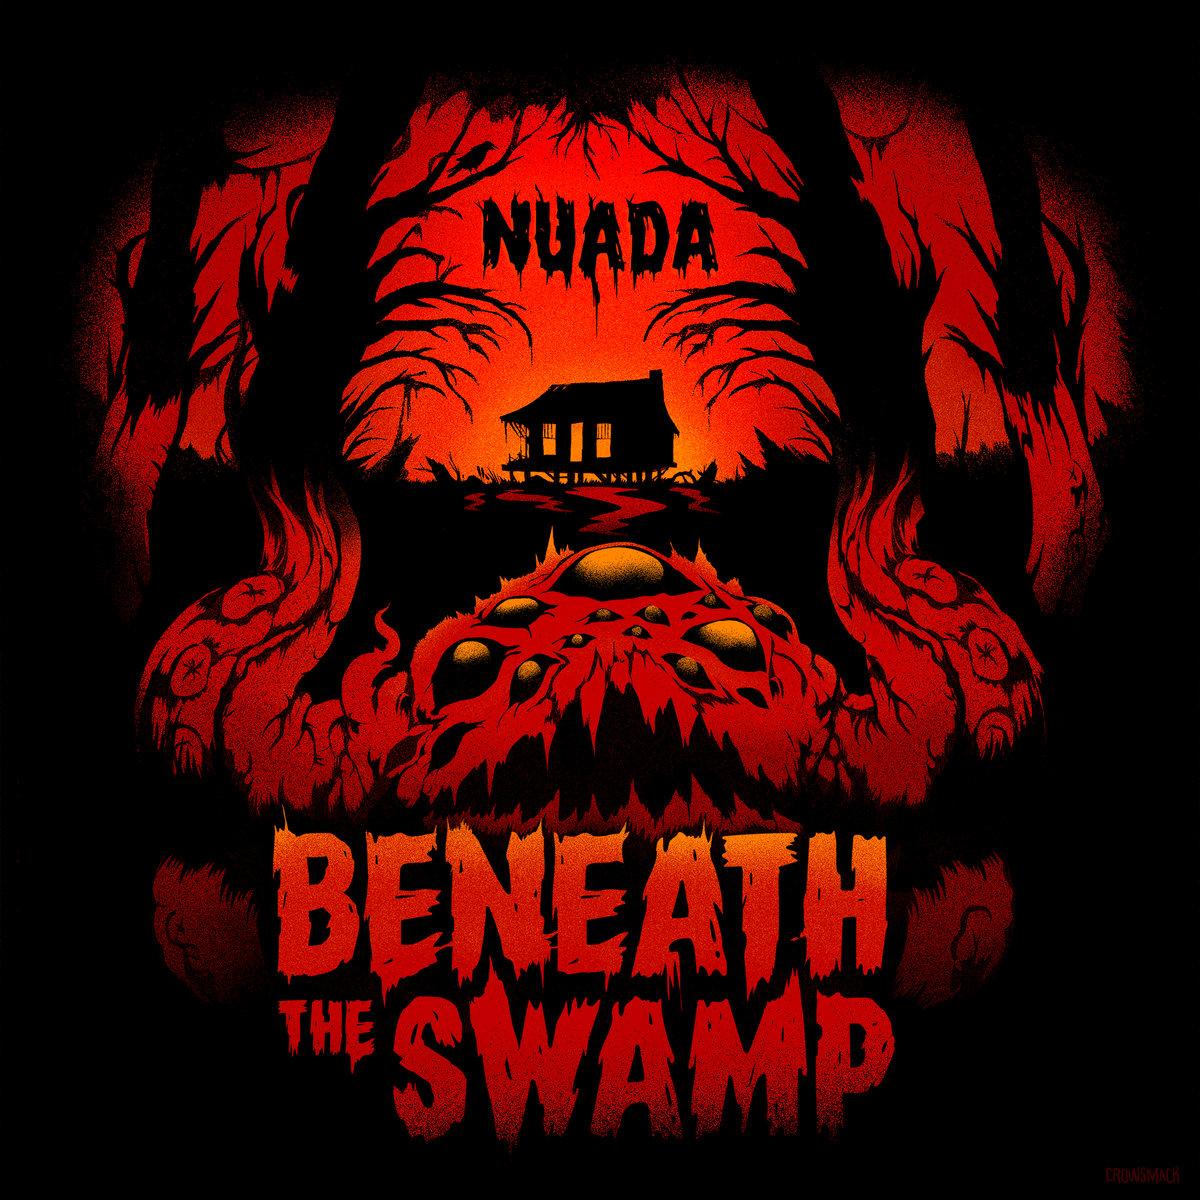 Nuada - Beneath the Swamp